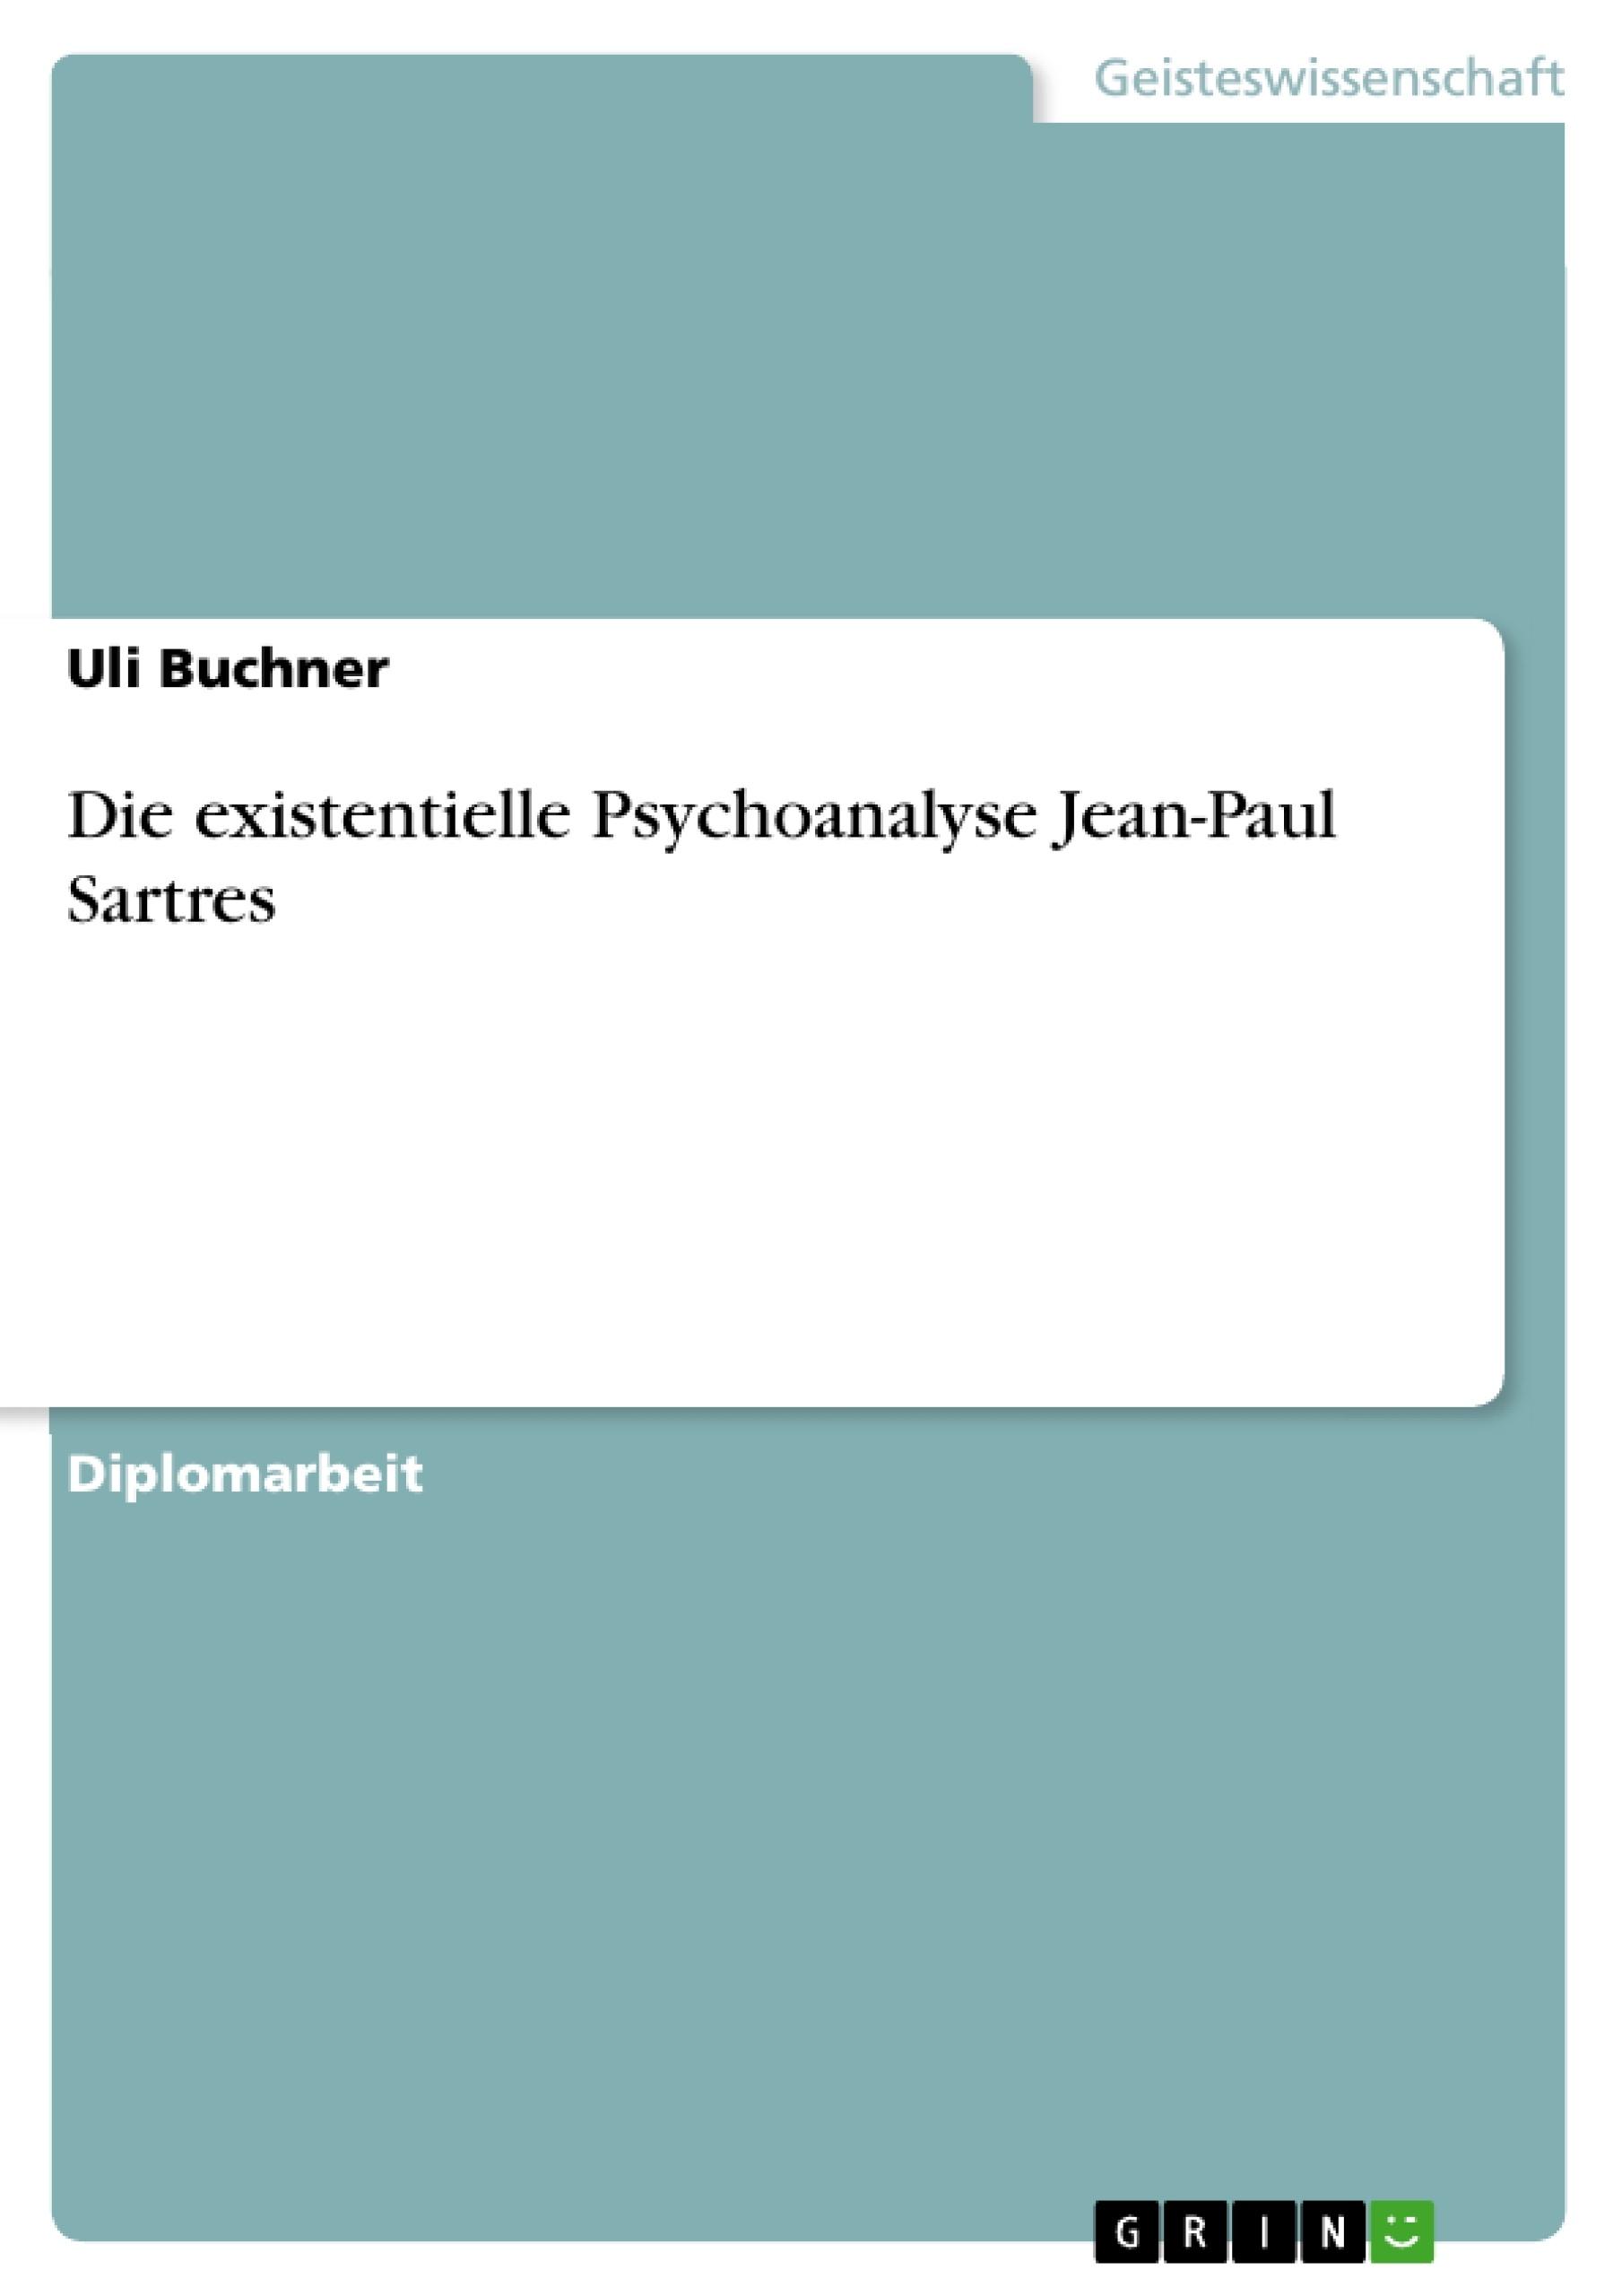 Title: Die existentielle Psychoanalyse Jean-Paul Sartres